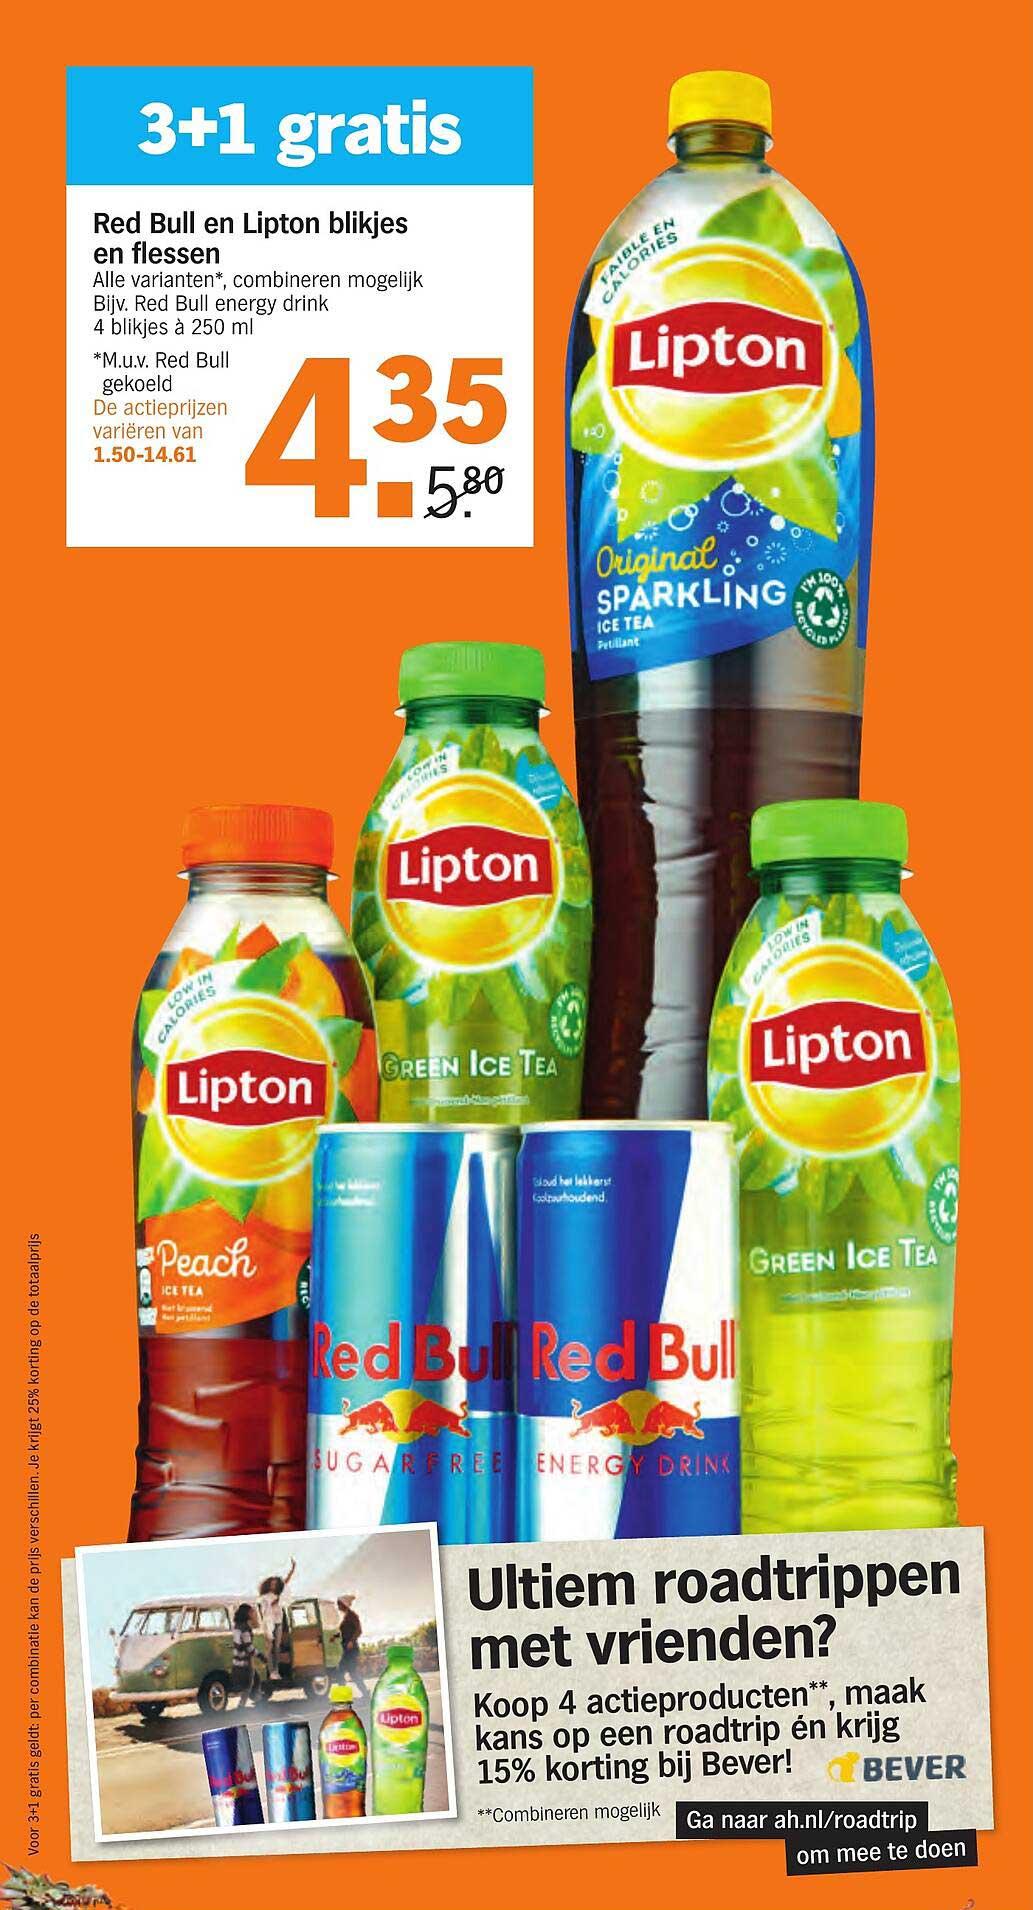 Albert Heijn Red Bull En Lipton Blikjes En Flessen 3+1 Gratis